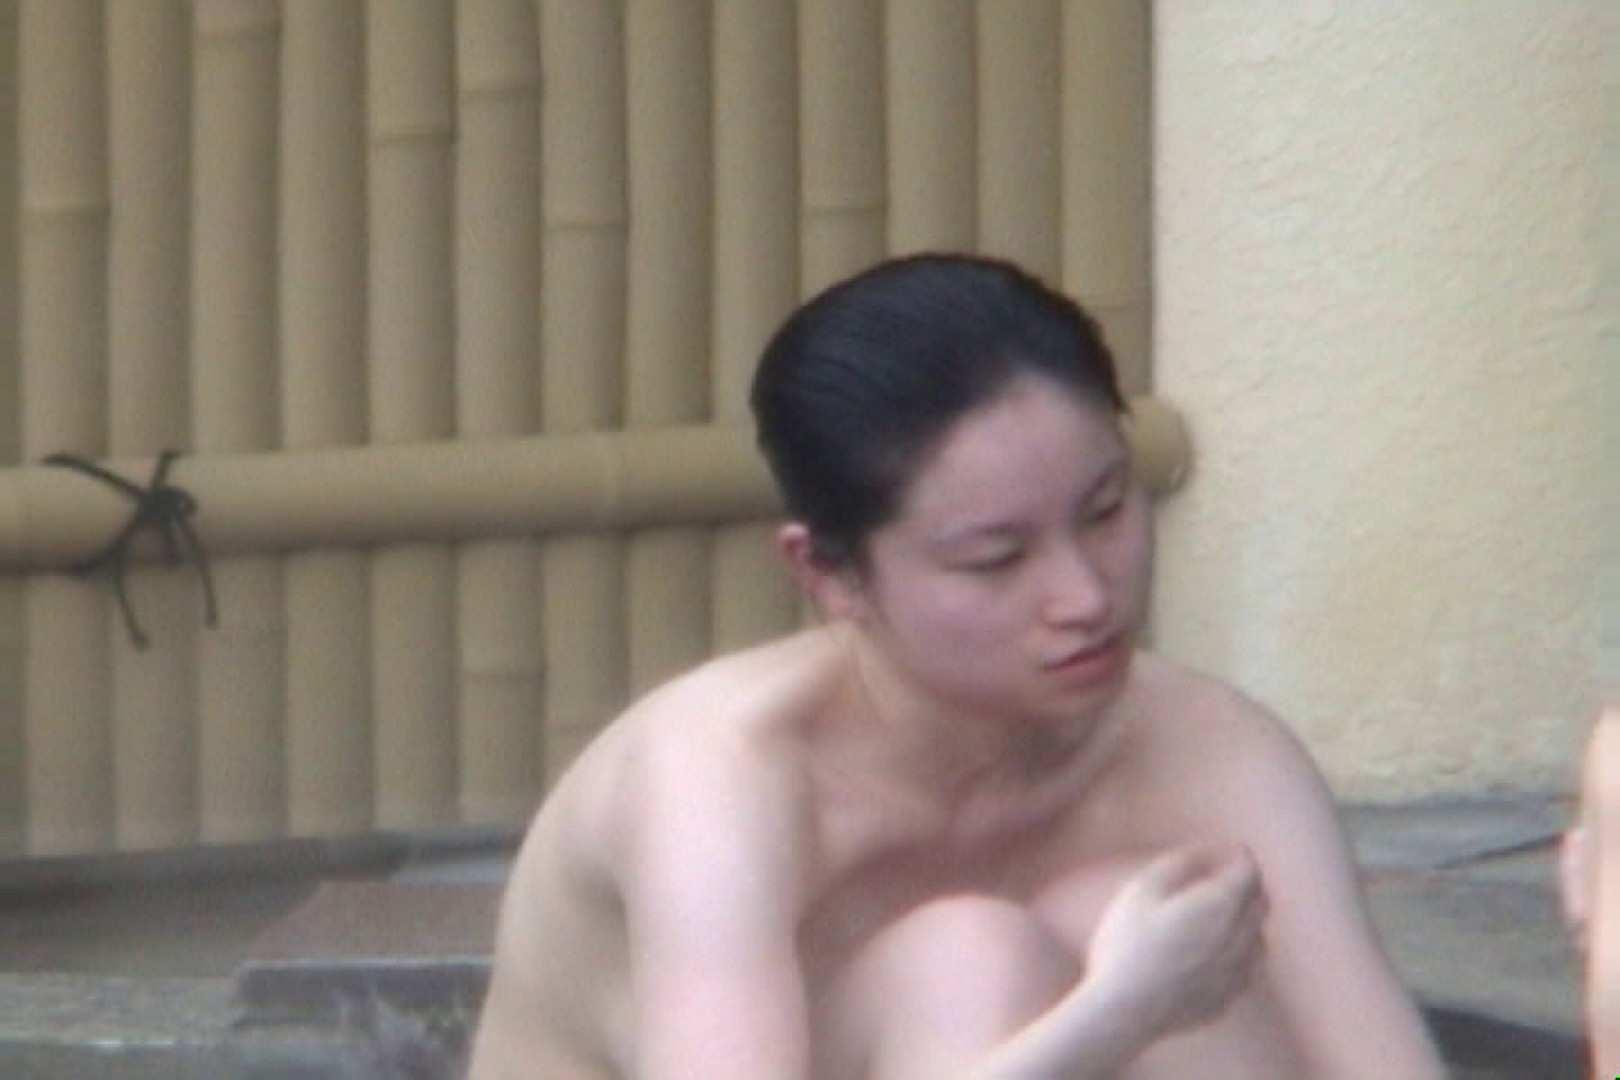 Aquaな露天風呂Vol.45【VIP限定】 HなOL   盗撮  100pic 87